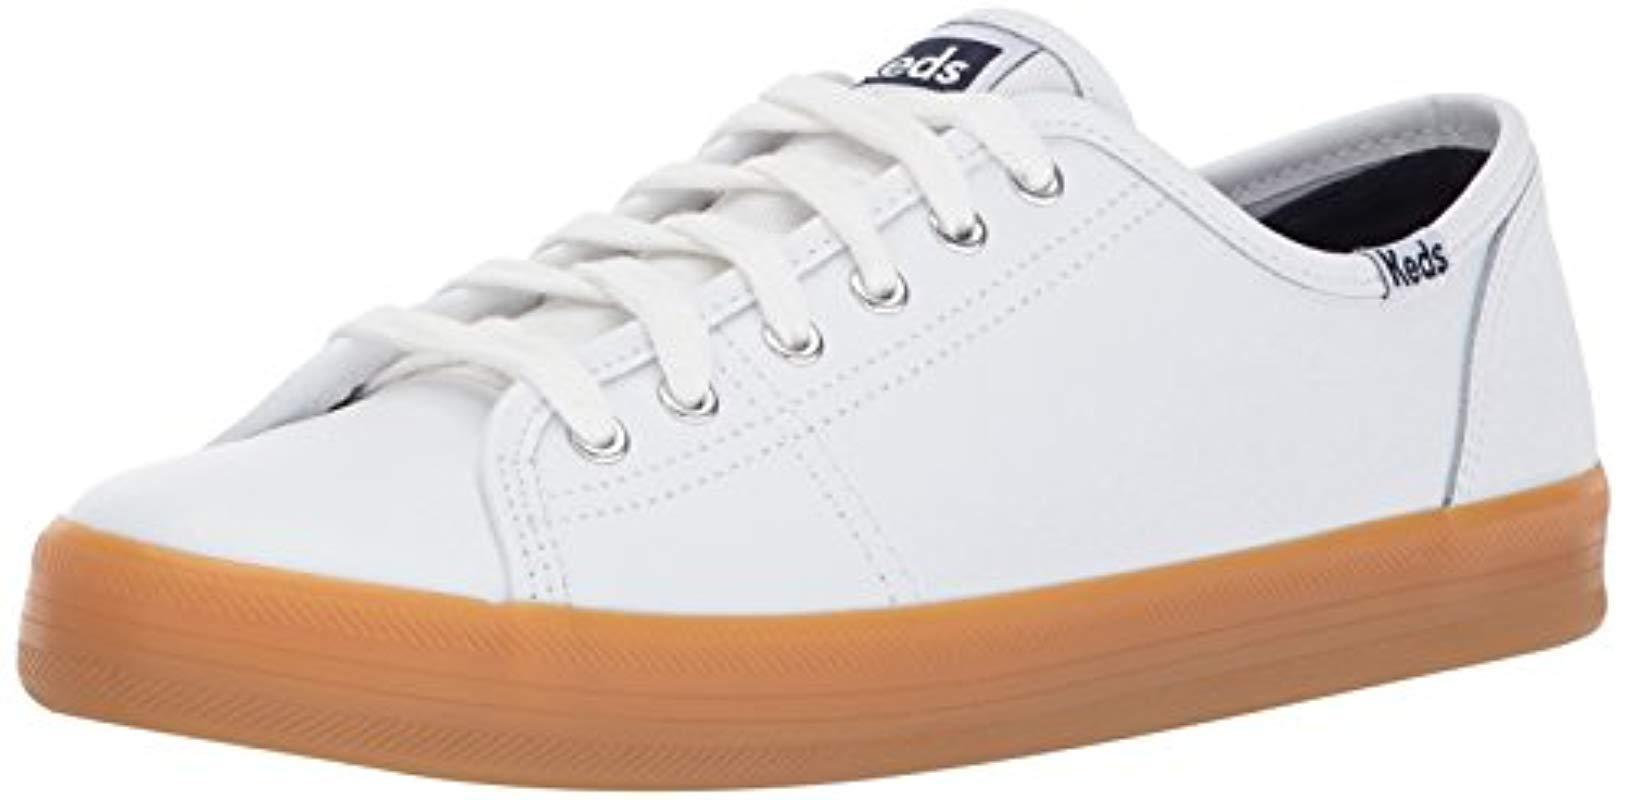 814239b7c3e Lyst - Keds Kickstart Cny Leather in White